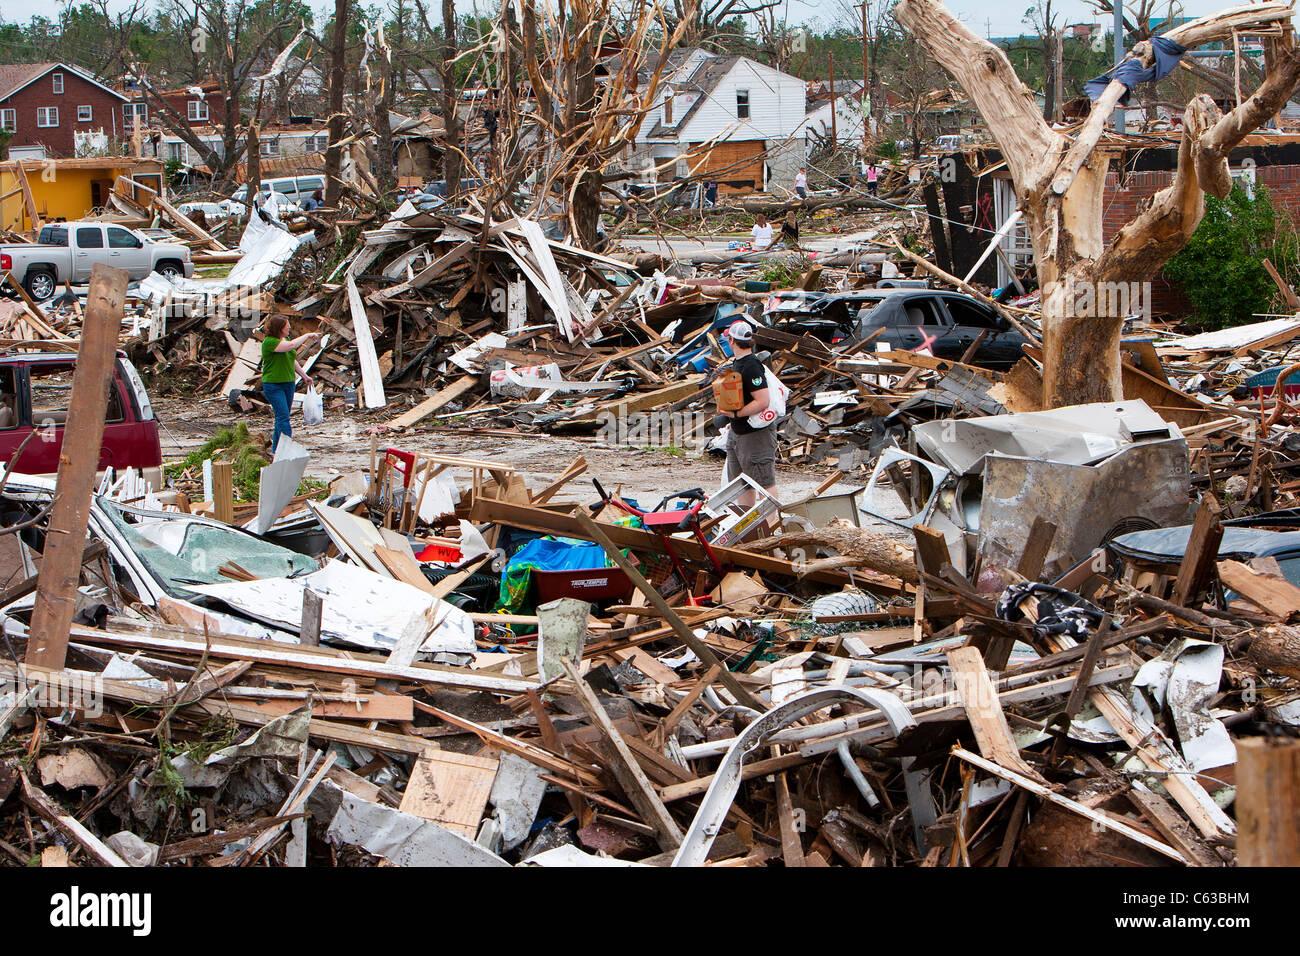 Survivors walk through a field of debris in Joplin, Missouri, May 25, 2011. - Stock Image